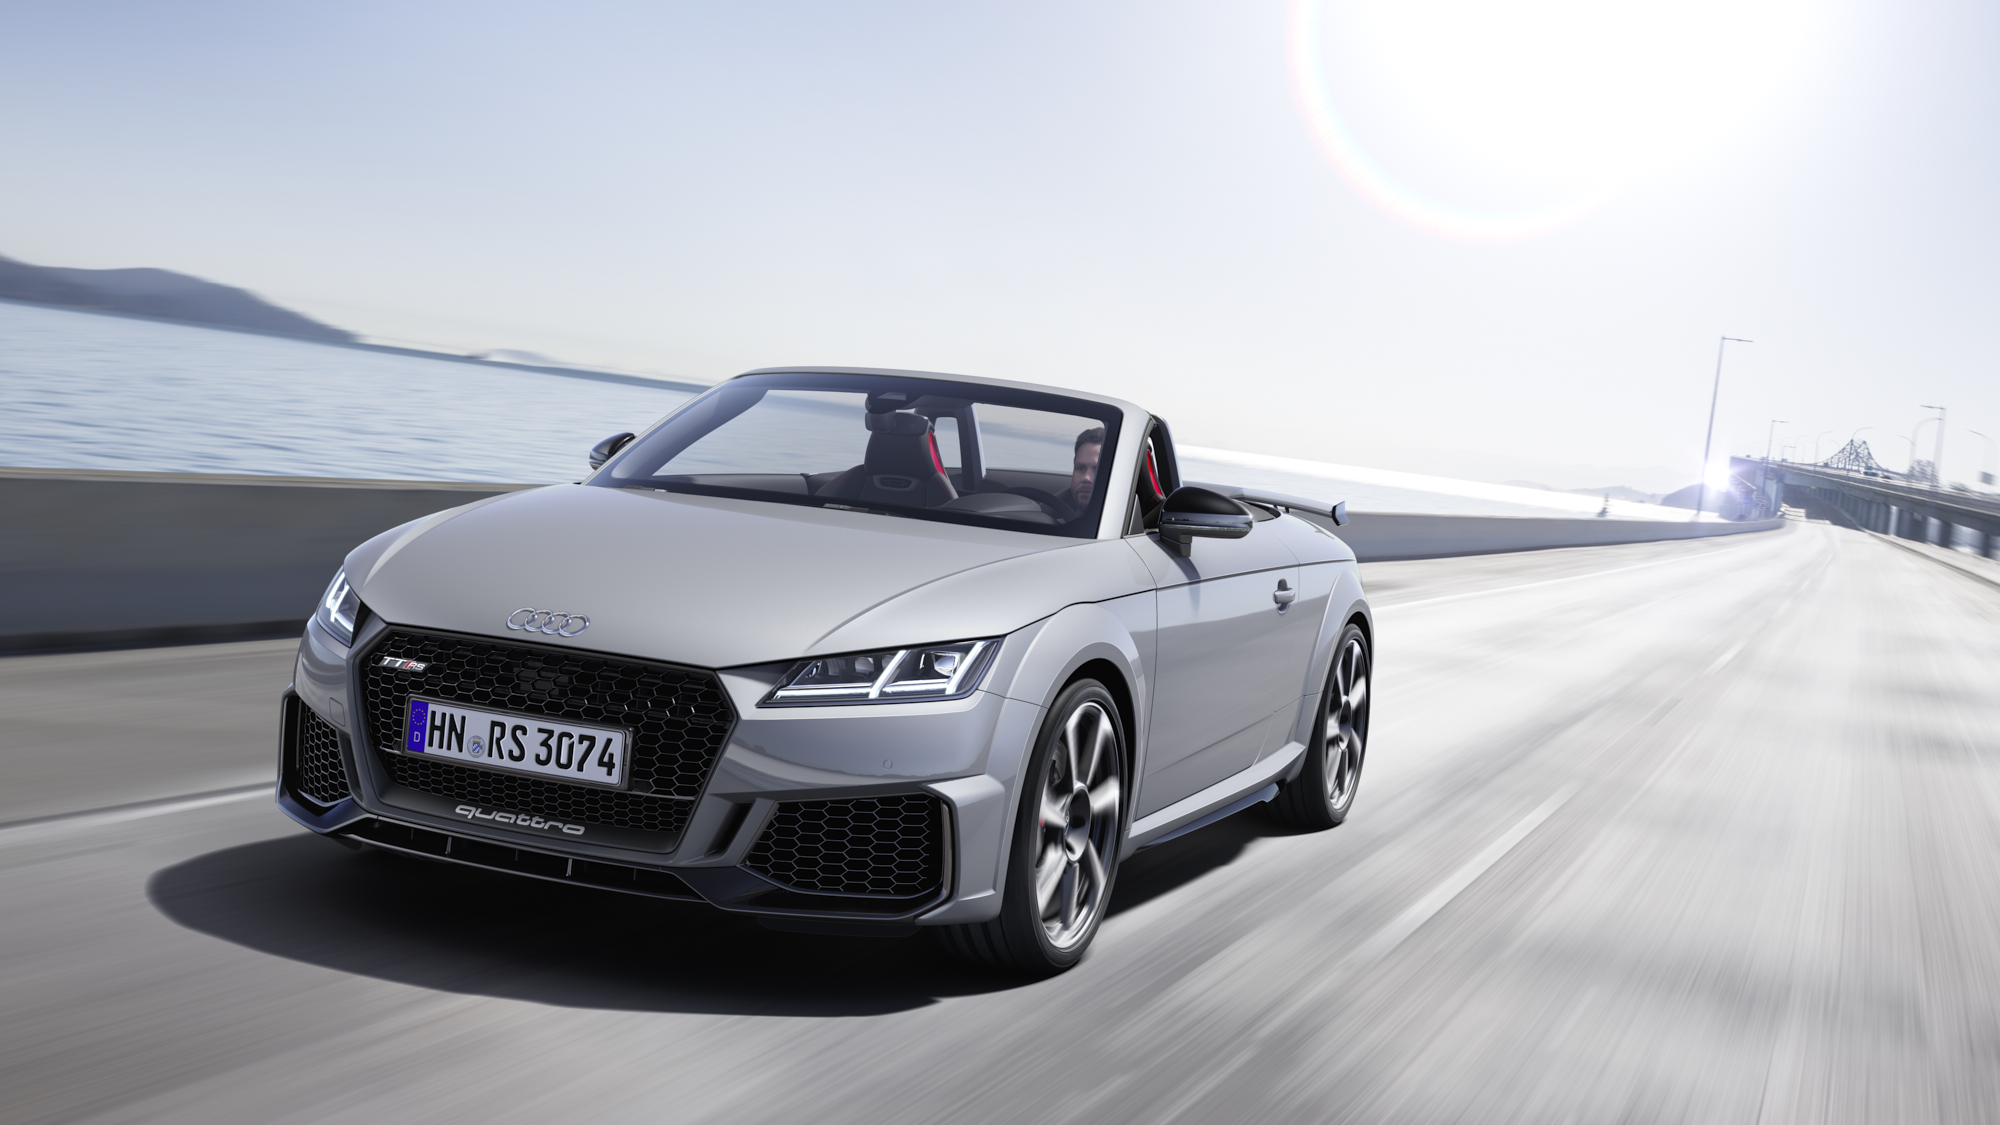 RWink_Audi_TT_RS_Roadster_Speed_002_B2200